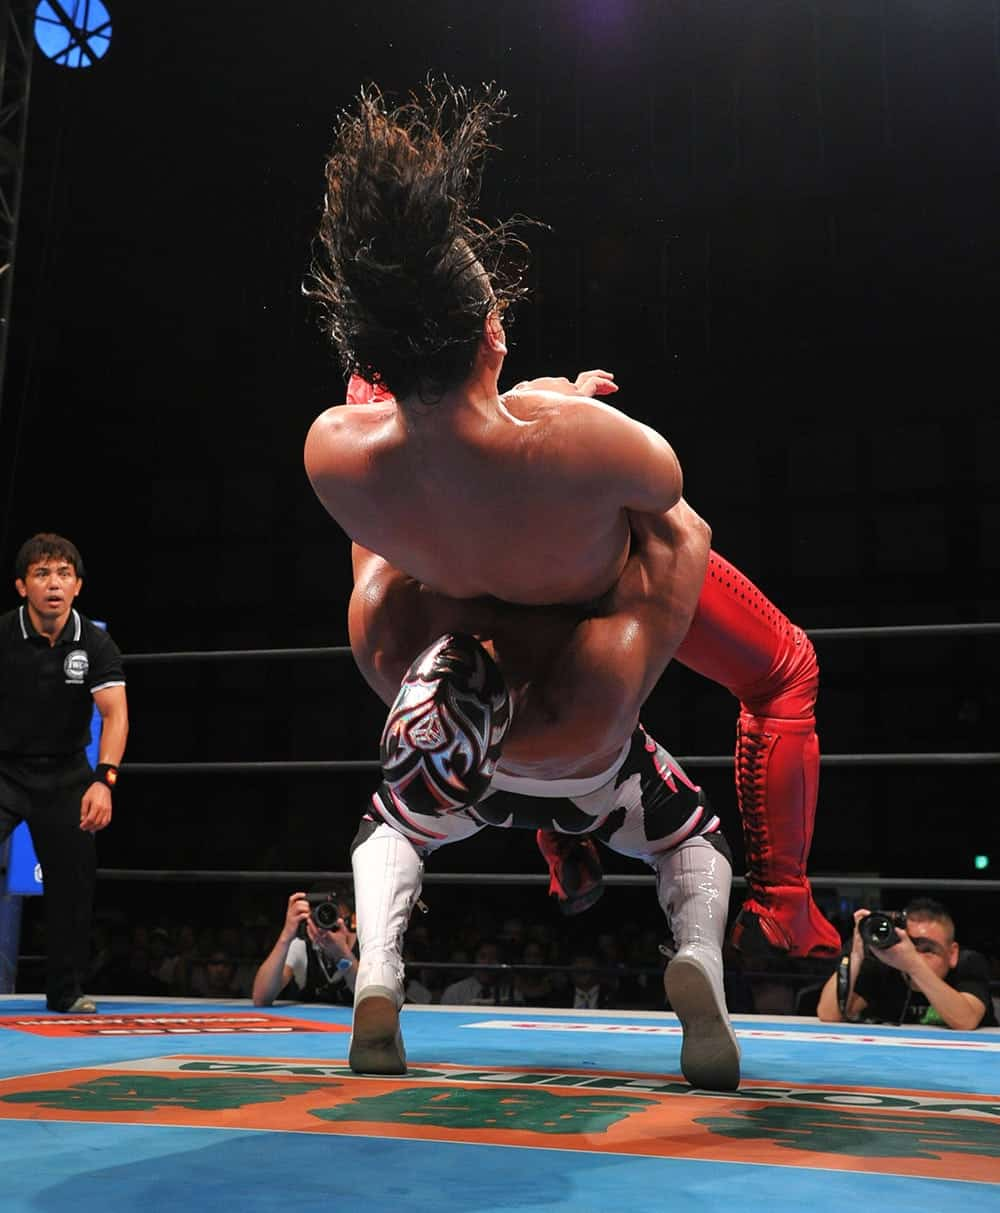 Sombra vs. Shinsuke Nakamura / Foto: Noboru Okawa.